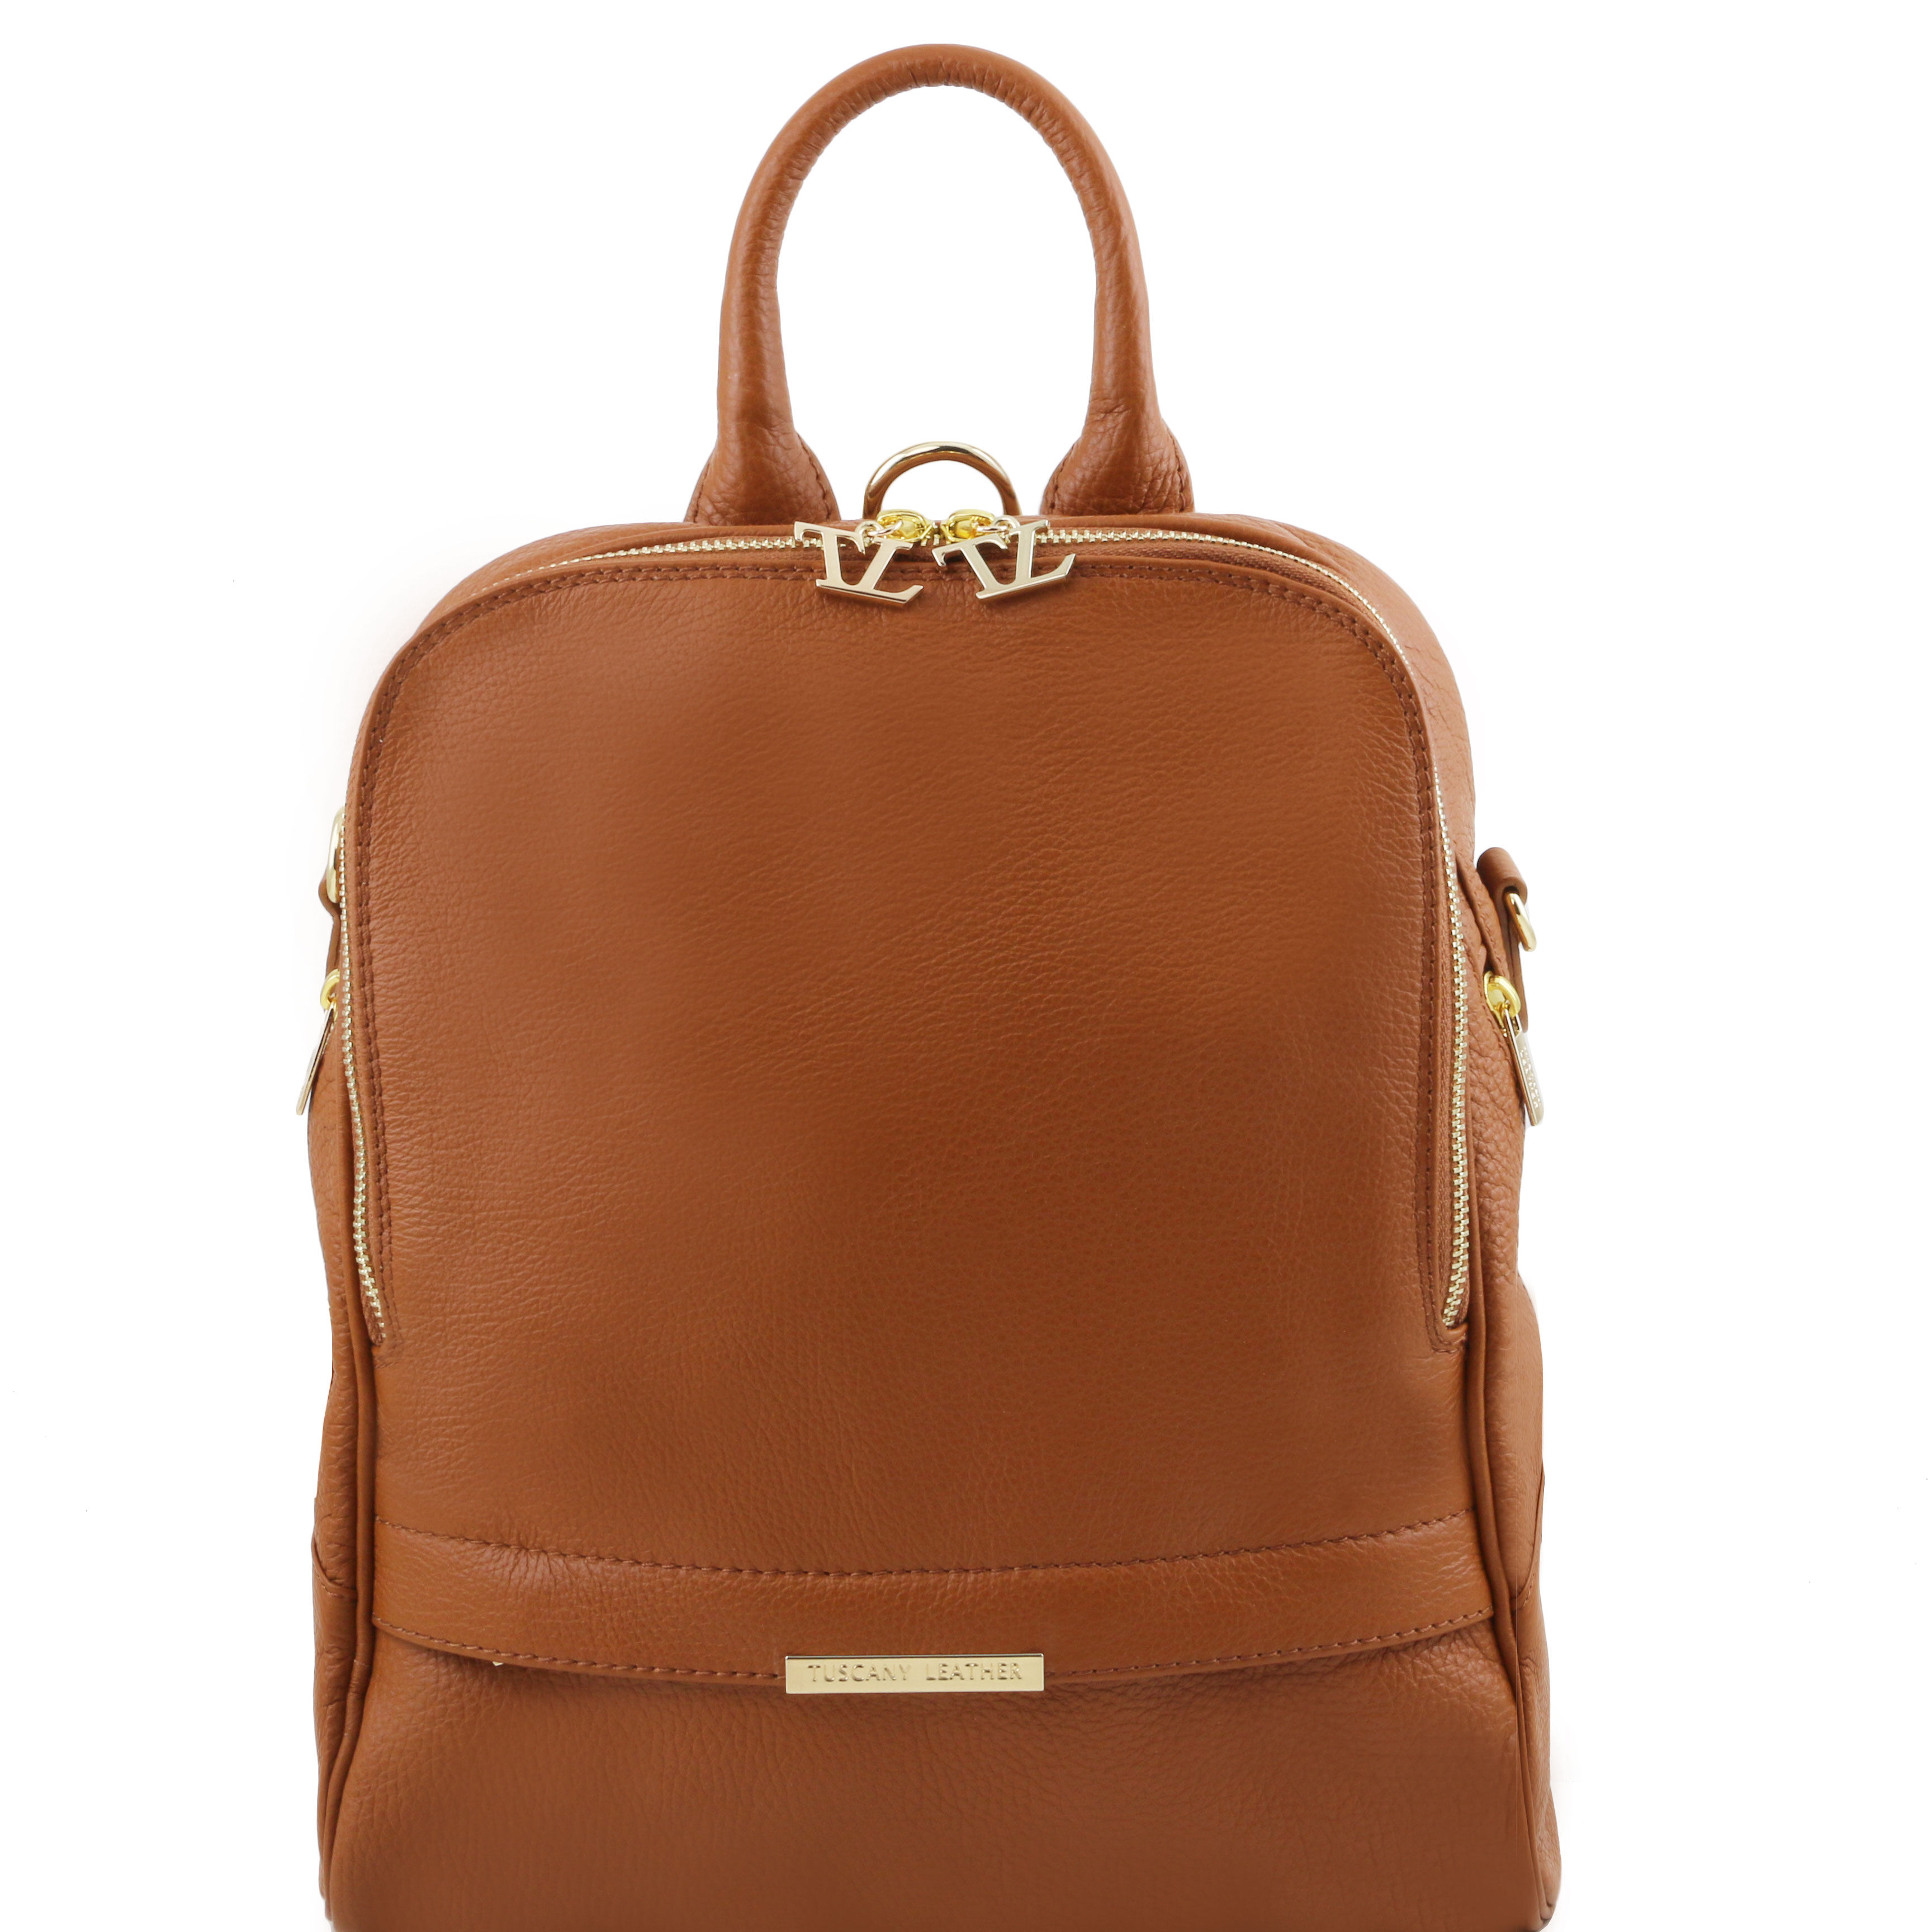 TL Bag Rucsac din piele cognac